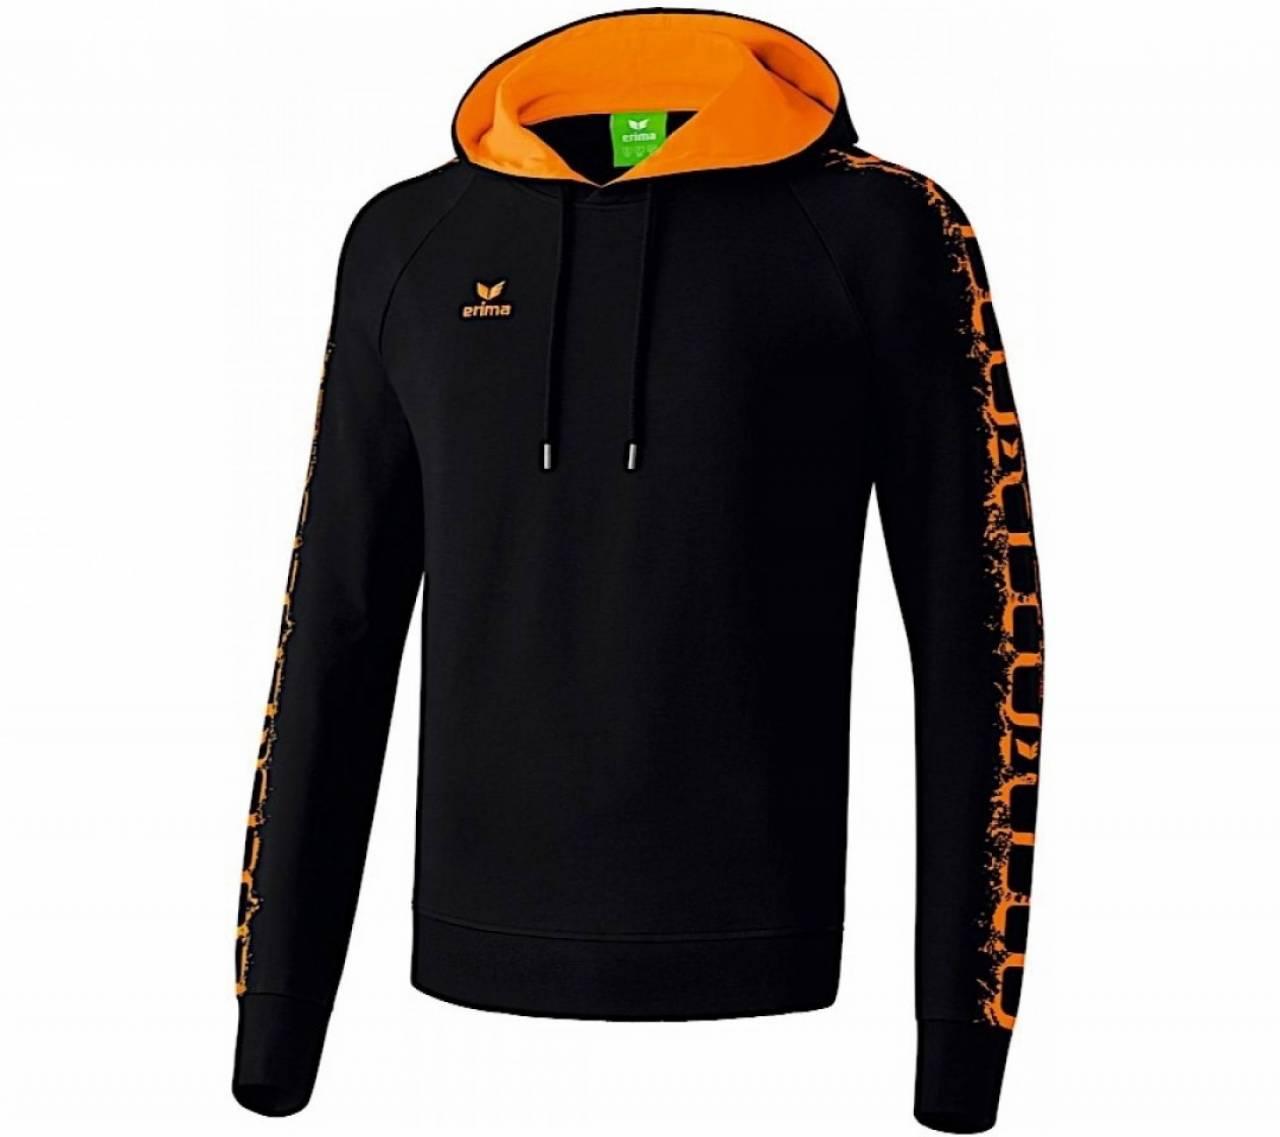 Erima Kinder Sweatshirt Graffic 5-C Hoodie